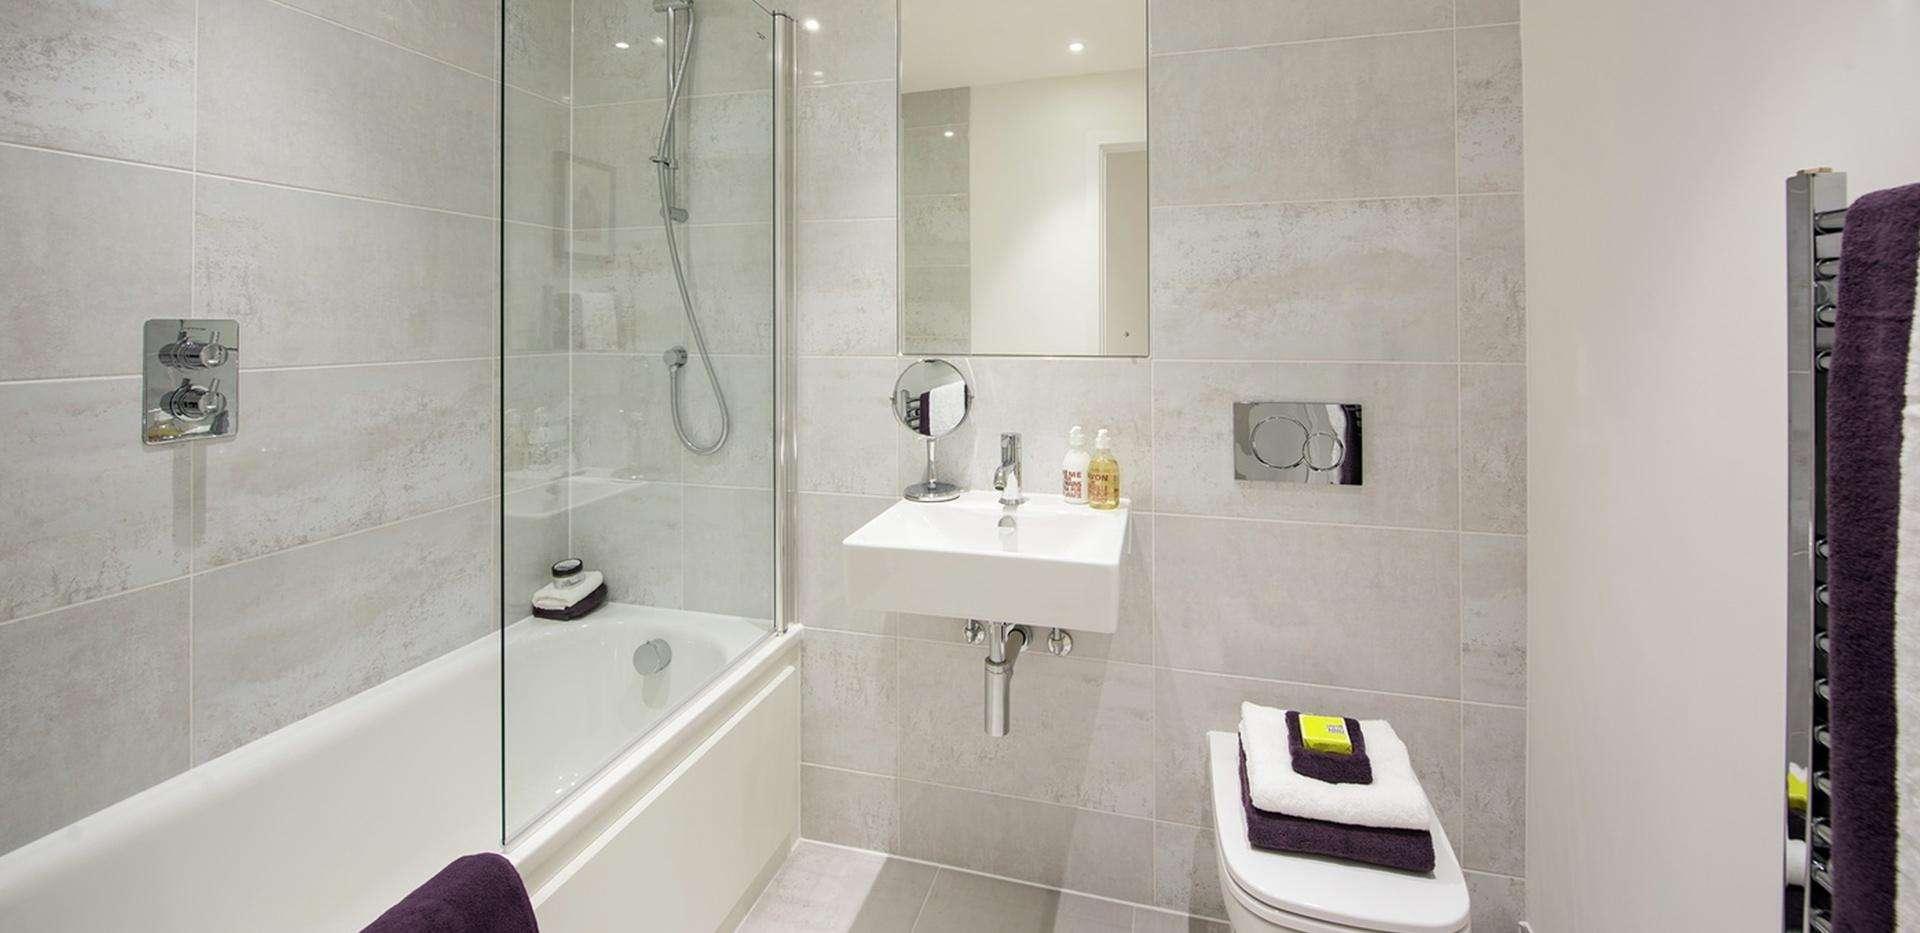 Apartment Second Bathroom.jpg